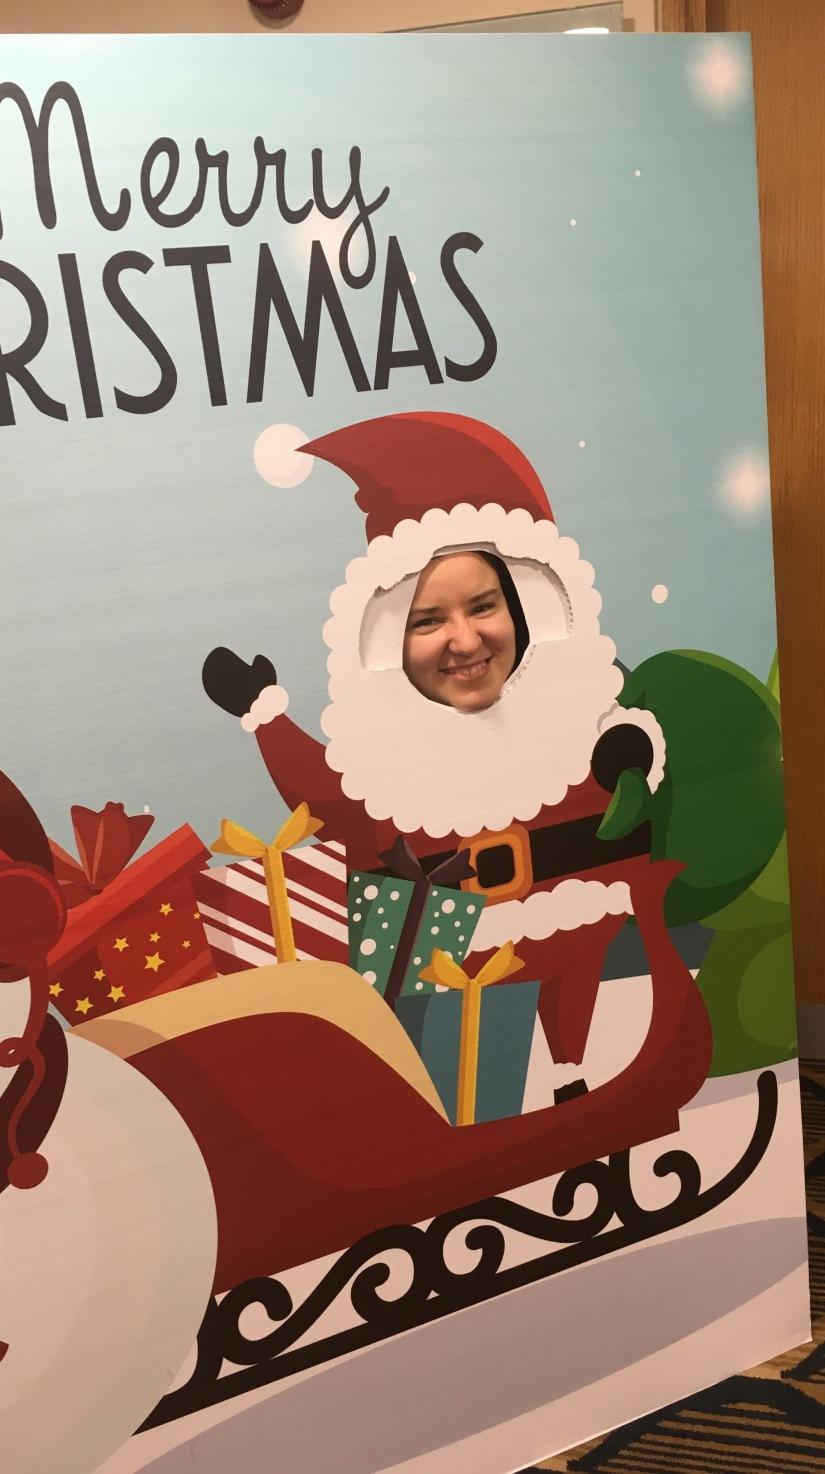 Happy Christmas, everyone!